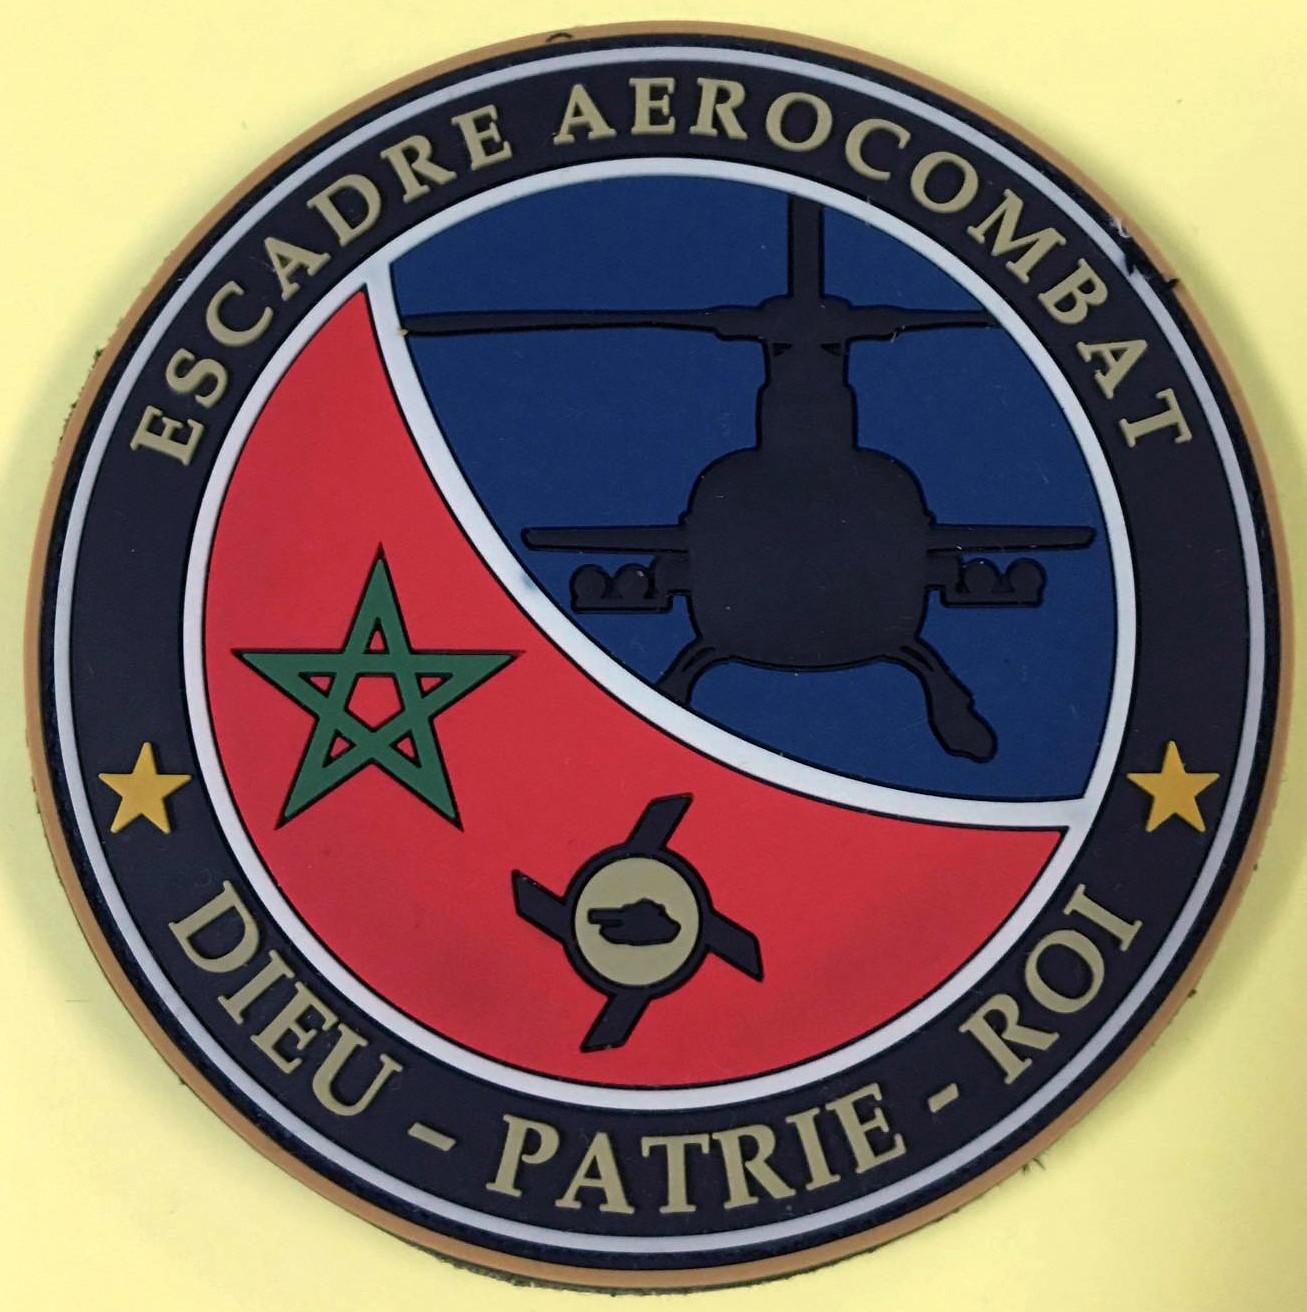 RMAF insignia Swirls Patches / Ecussons,cocardes et Insignes Des FRA - Page 7 49201315253_40b4cc9db7_h